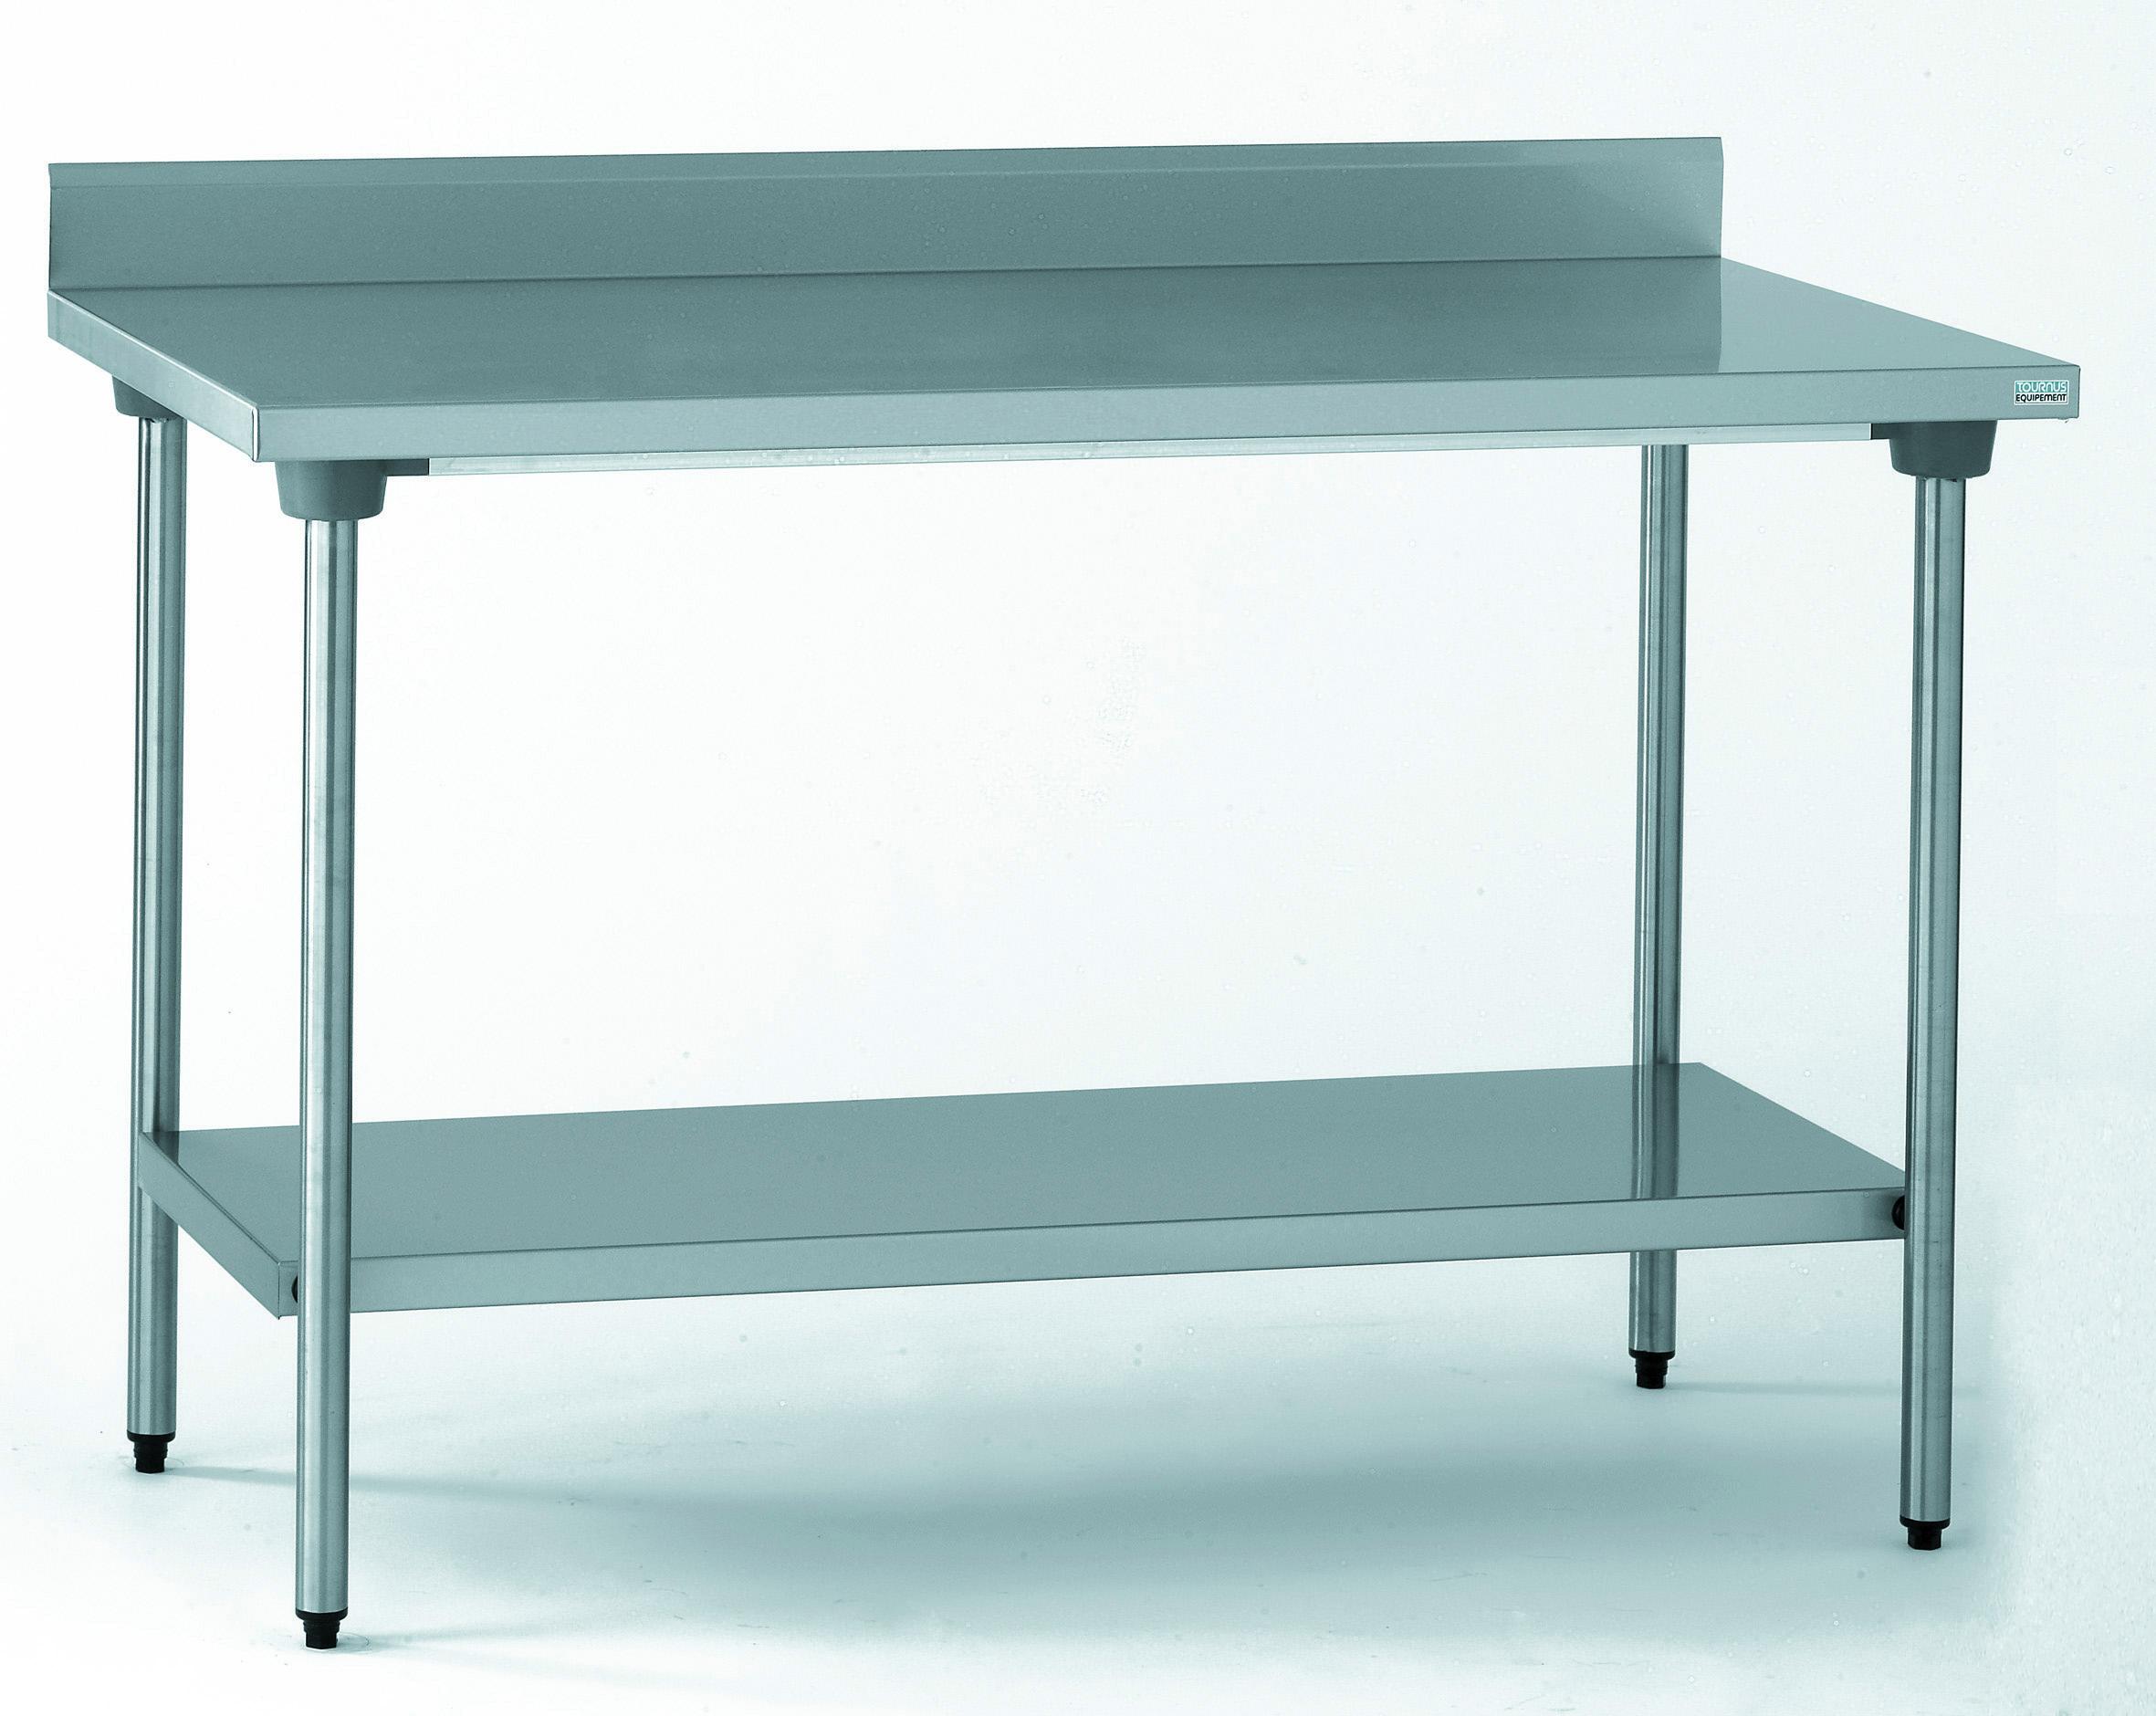 TABLE CHR ADOS+ETAG. 700X1000